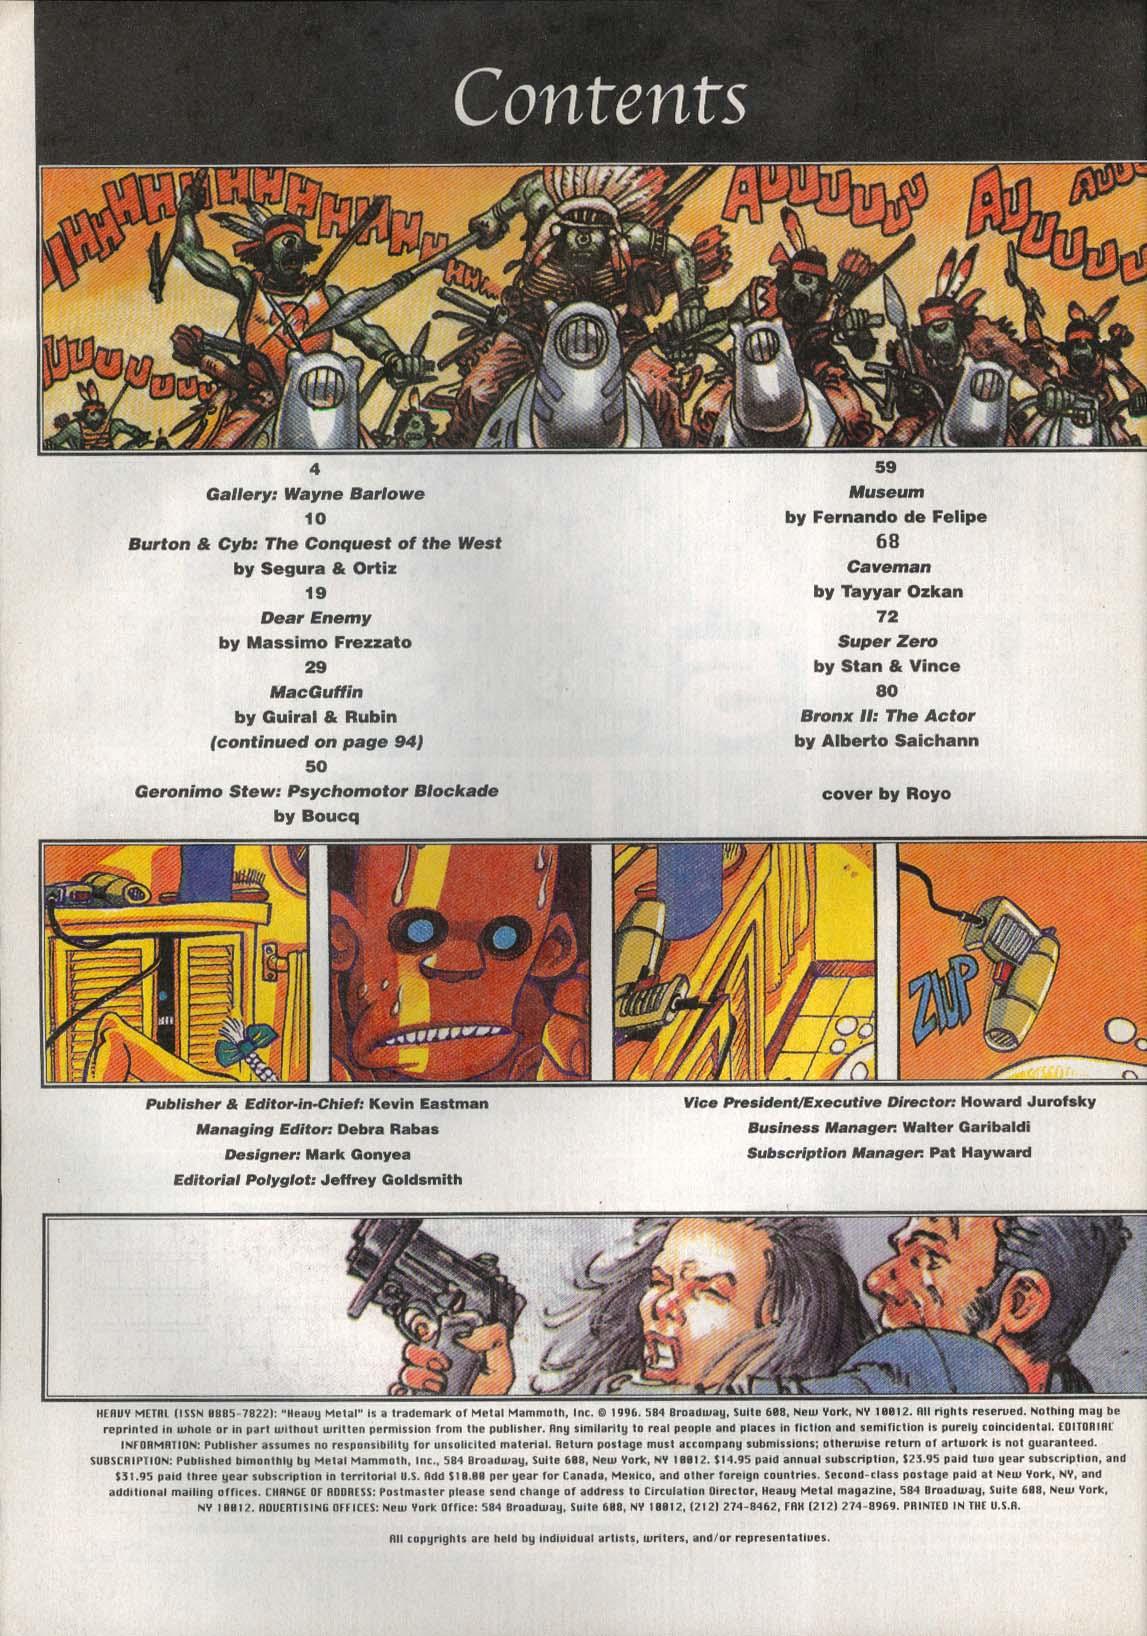 HEAVY METAL Frezzato Segura & Ortiz Boucq Royo Tayyar Ozkan Stan & Vince 1 1996